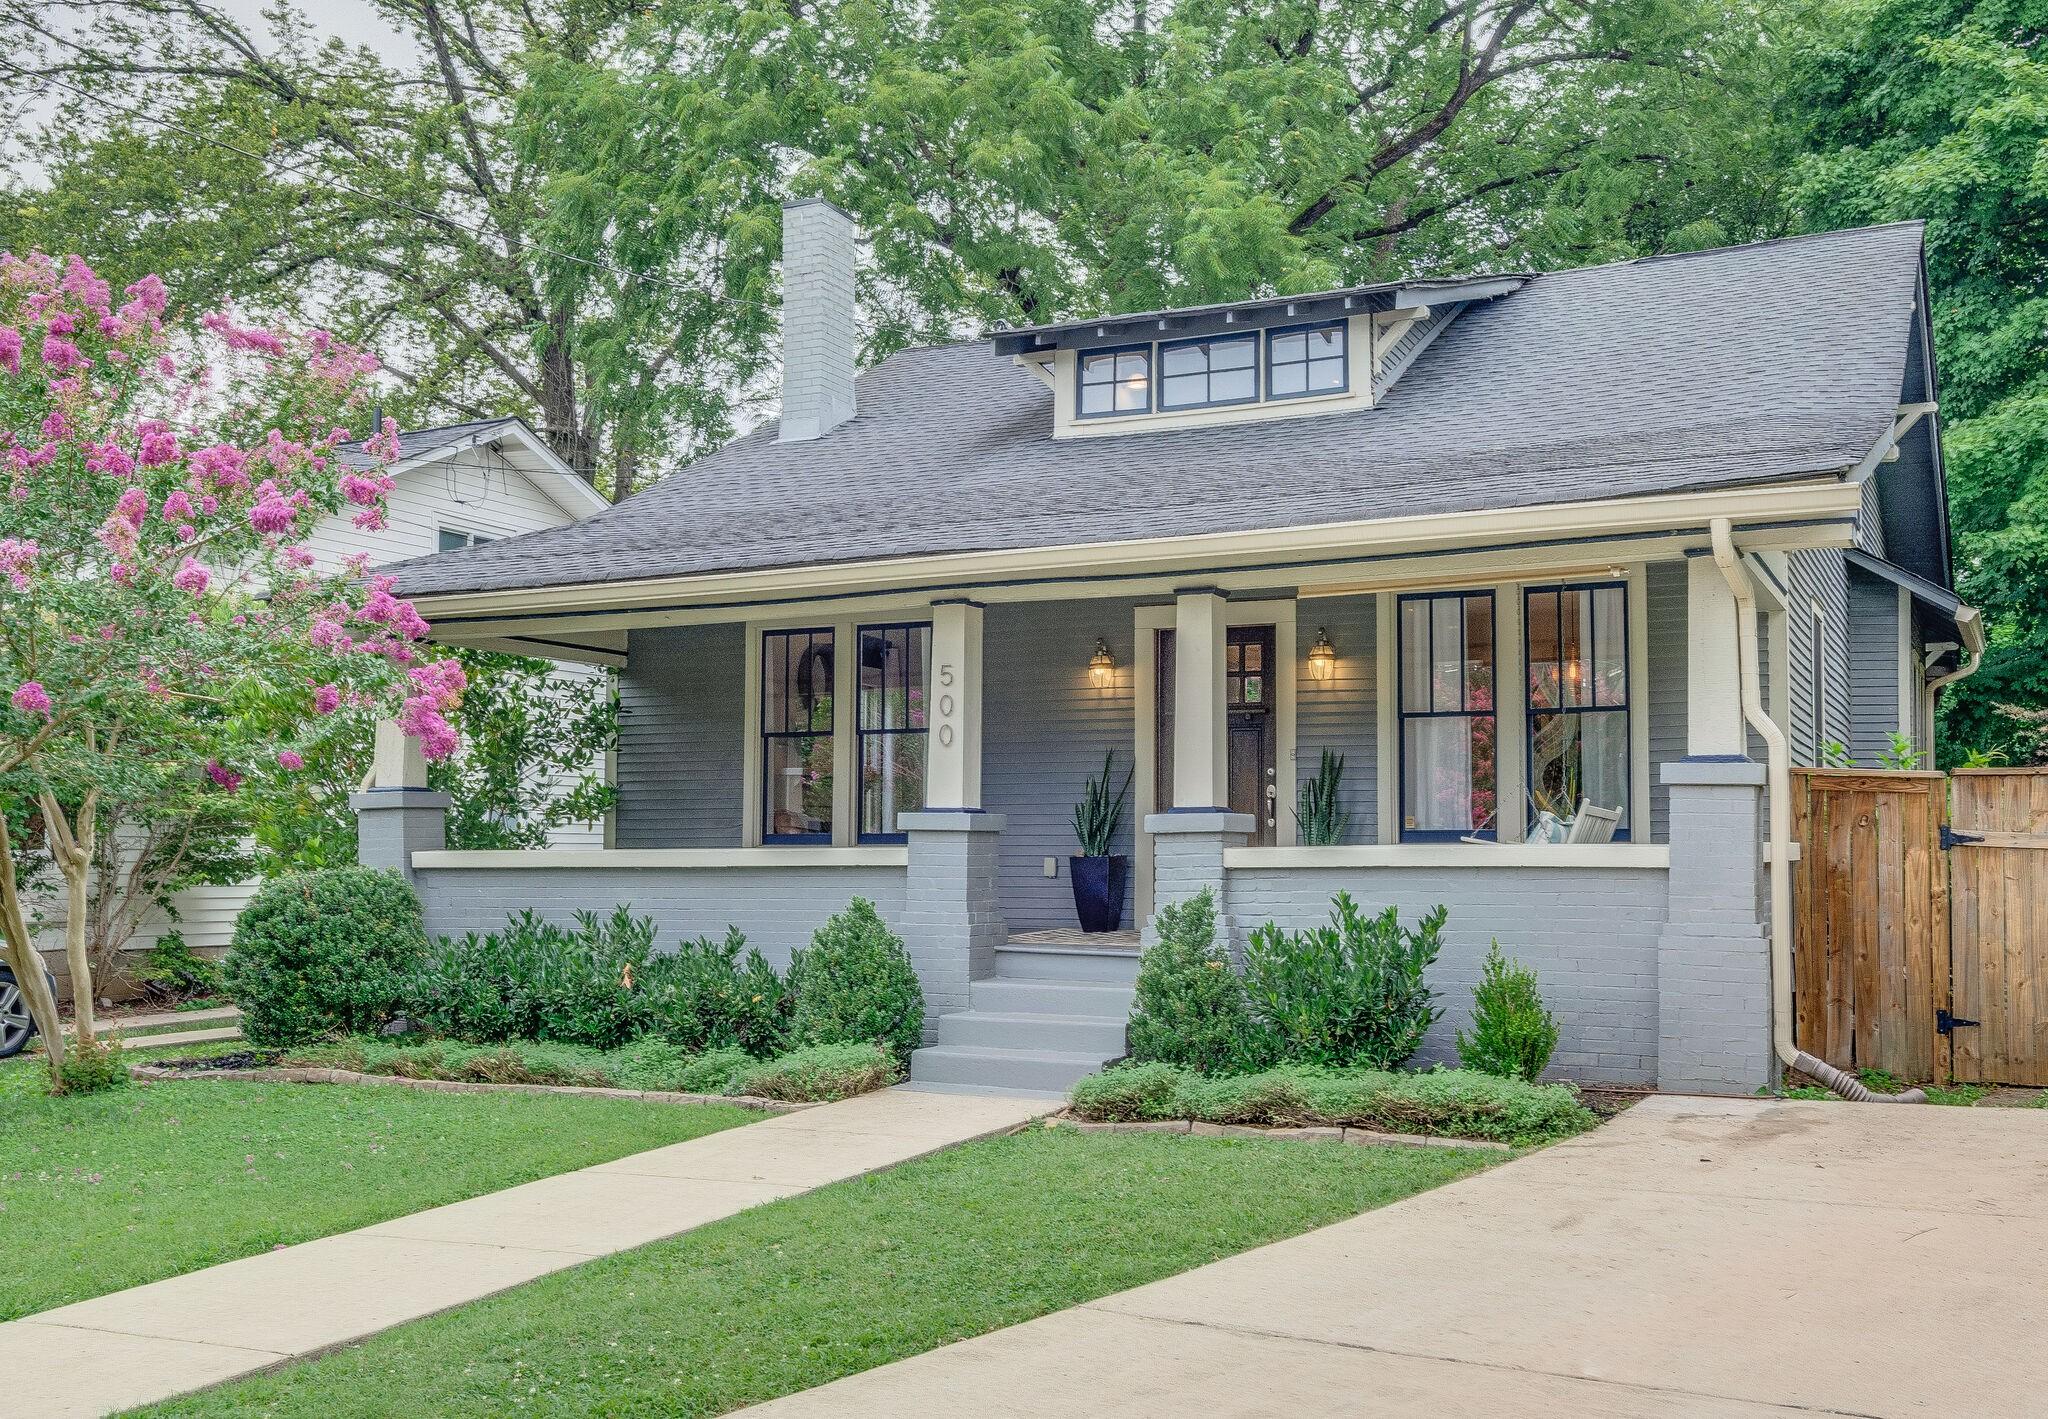 500 N Wilson Blvd Property Photo - Nashville, TN real estate listing